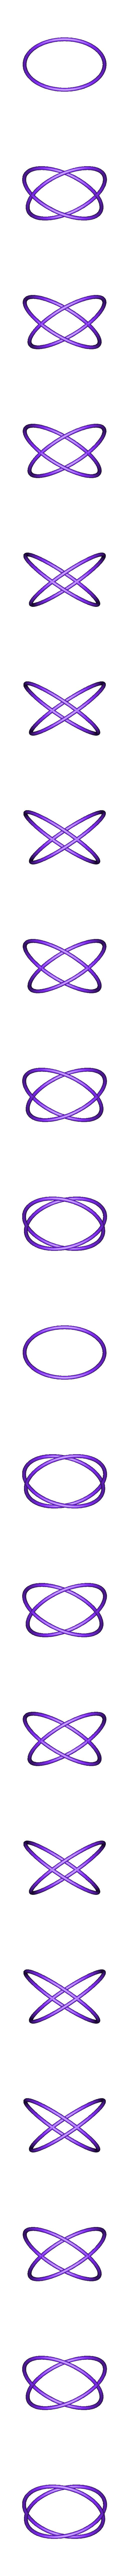 lamp_dual_extruder_v2_part_2.stl Download free STL file Kerosene lamp • 3D printer design, poblocki1982